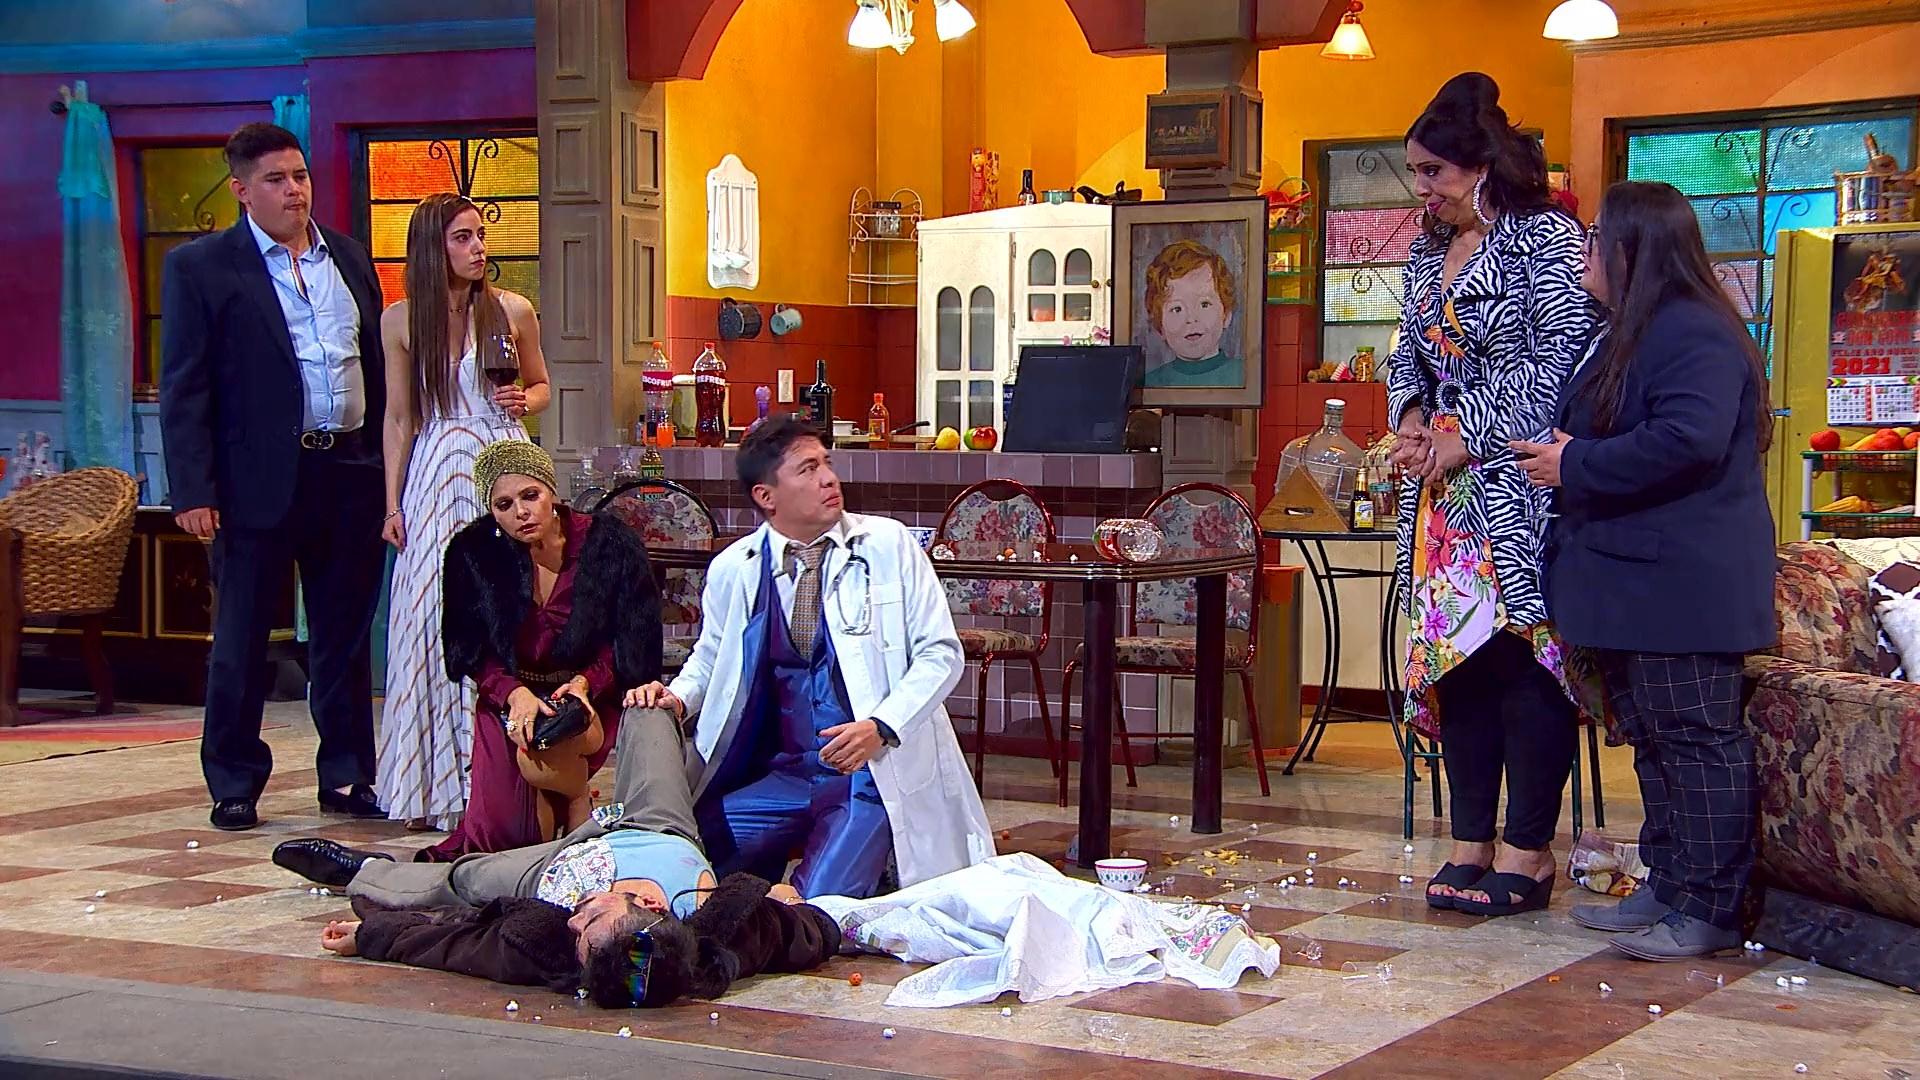 Se Rentan Cuartos Temporada 3 (2021) 1080p WEB-DL Latino